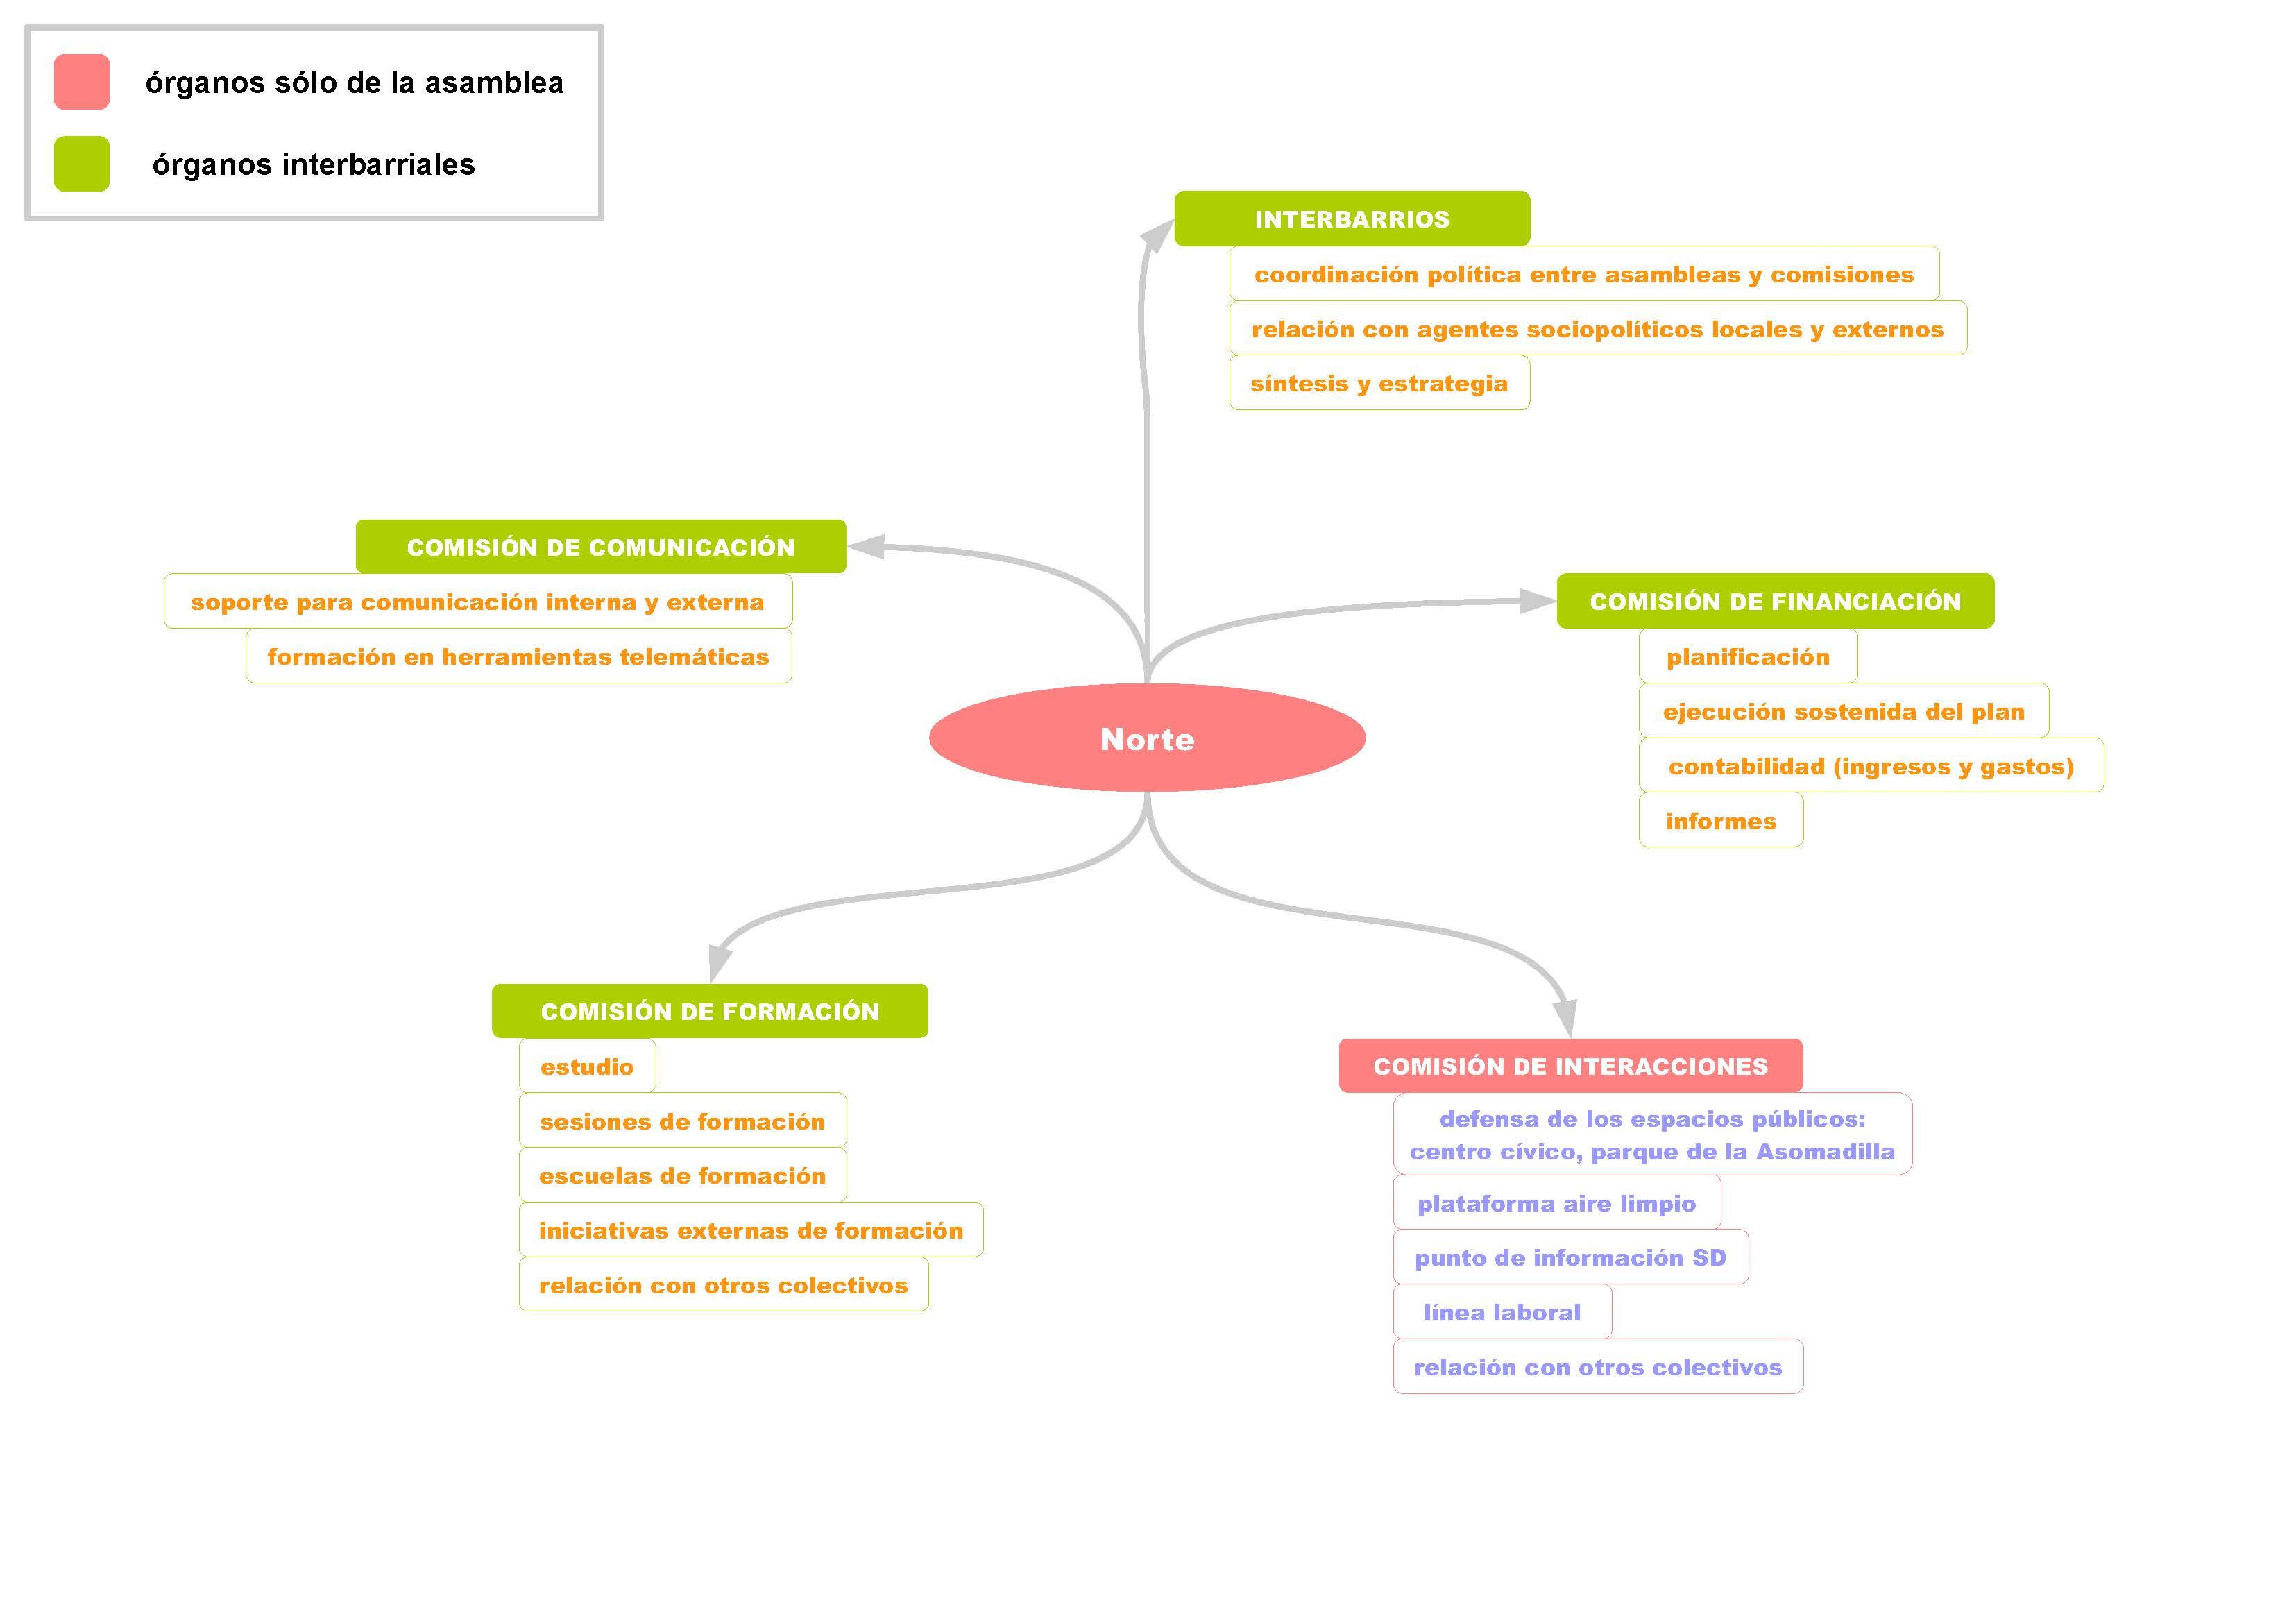 20130119 AN - Organigrama